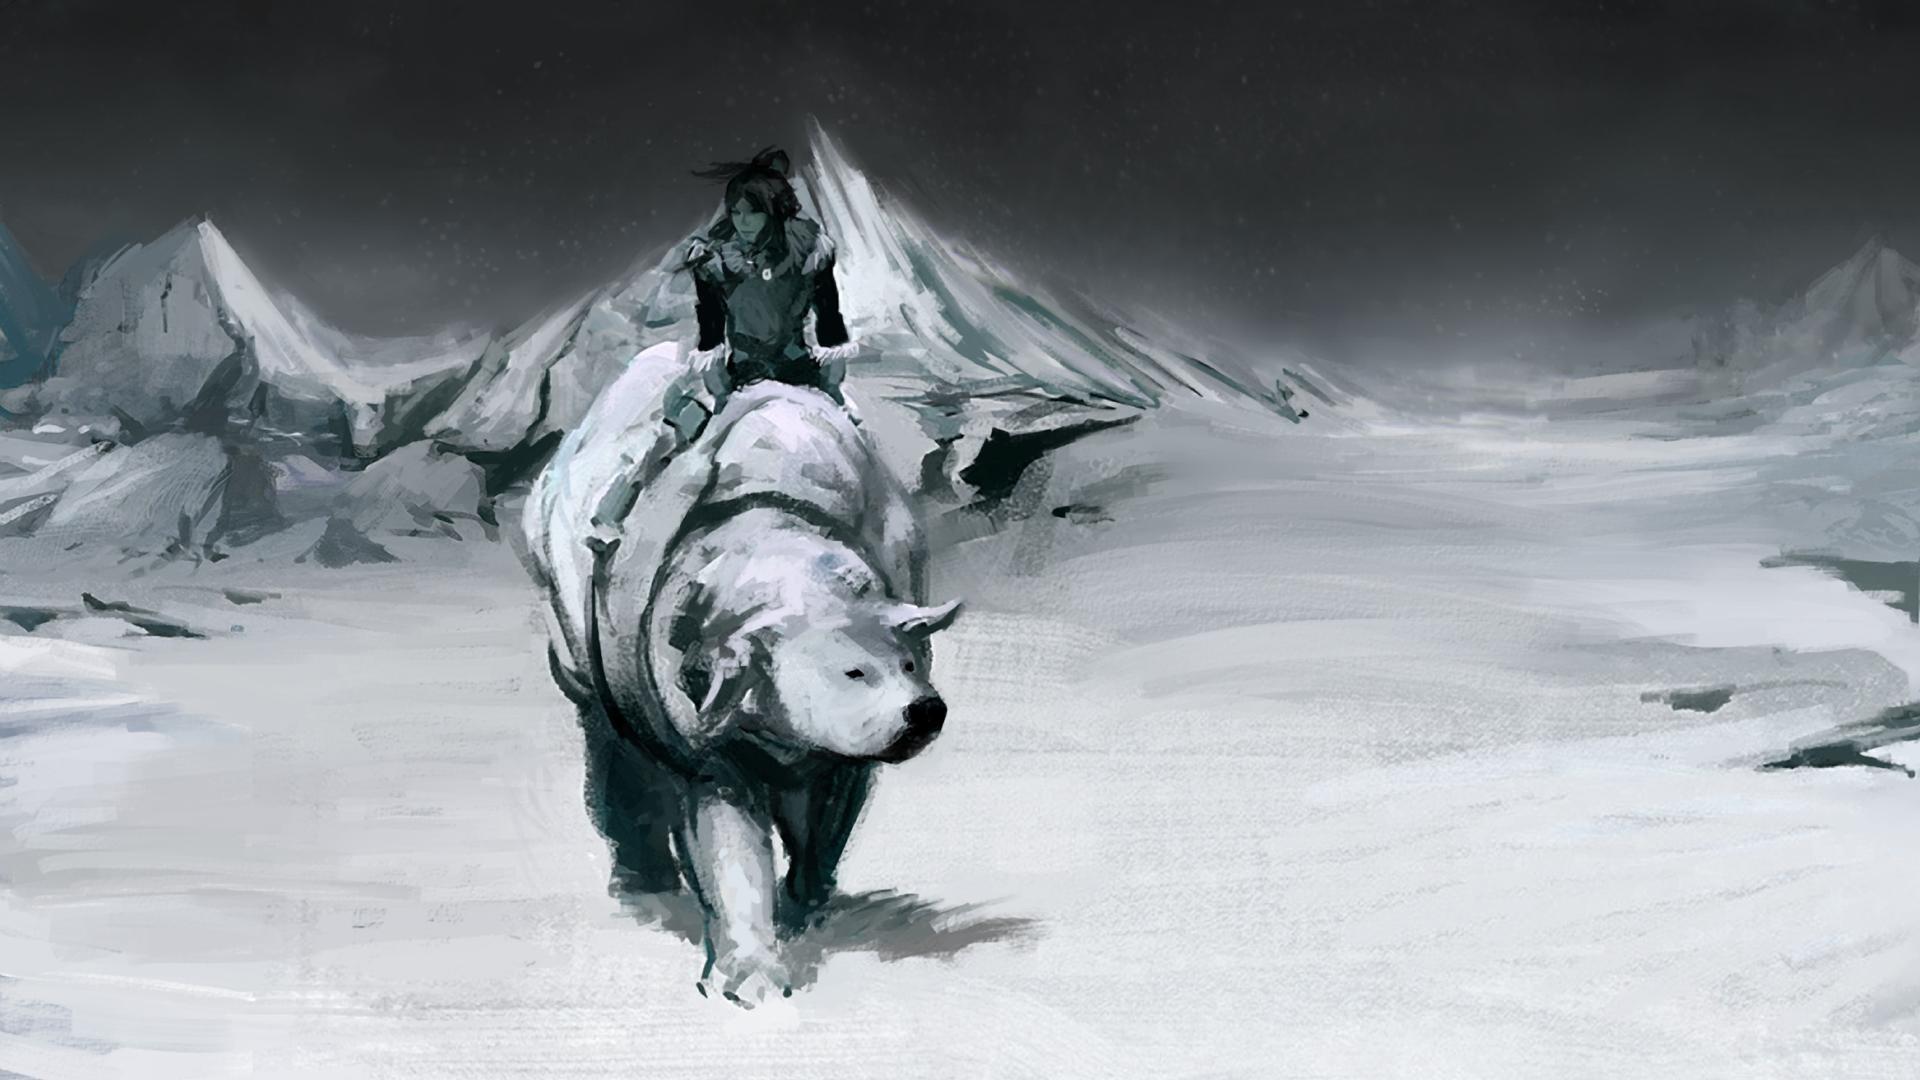 [No Spoilers] Avatar Wallpaper Dump : TheLastAirbender